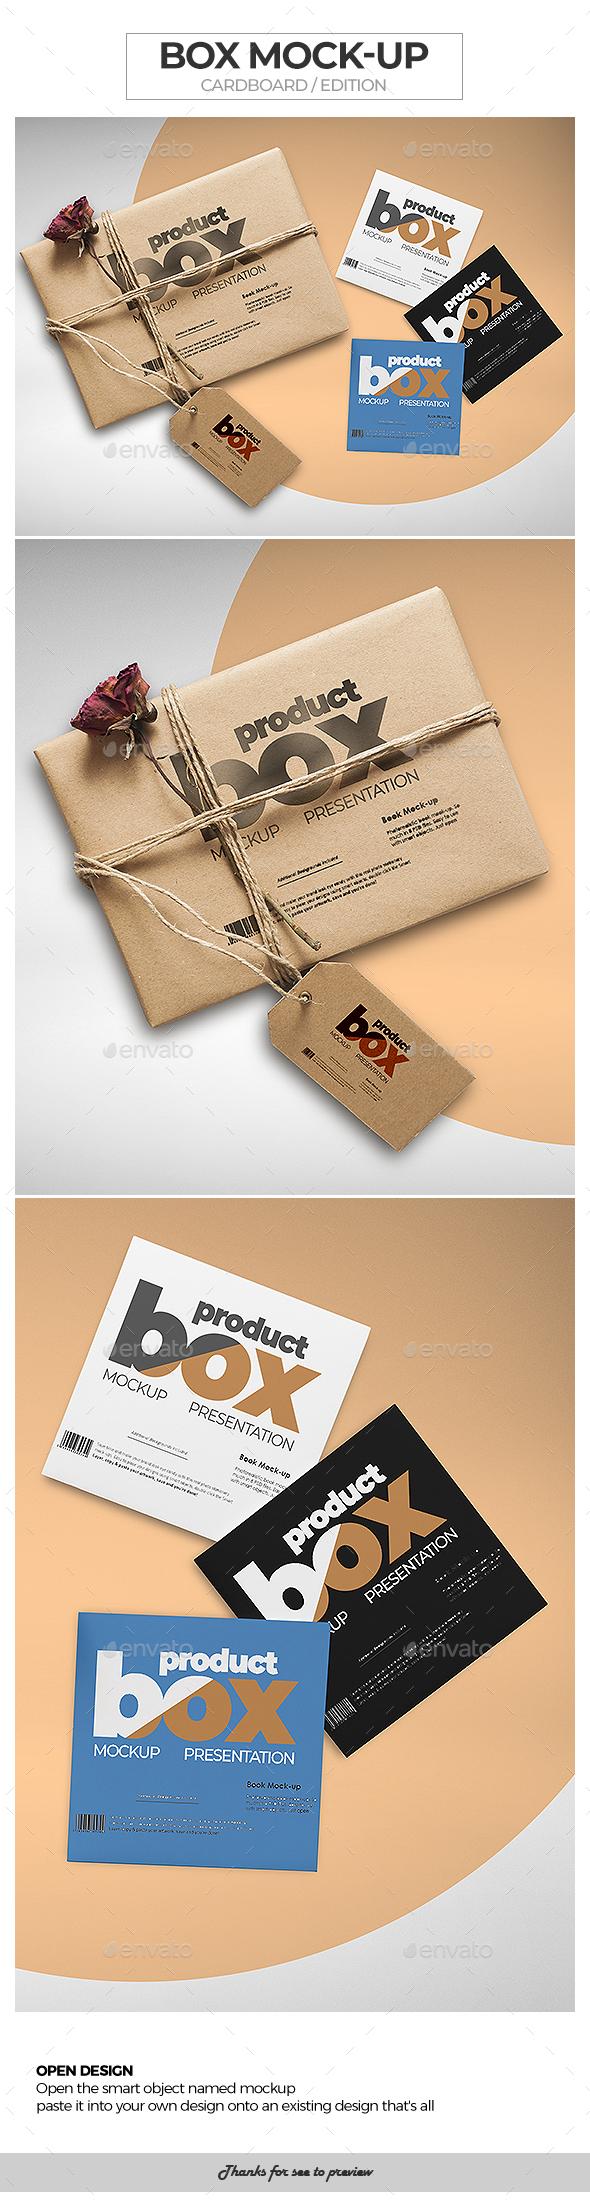 Box Mock-Up / Cardboard Edition - Packaging Product Mock-Ups